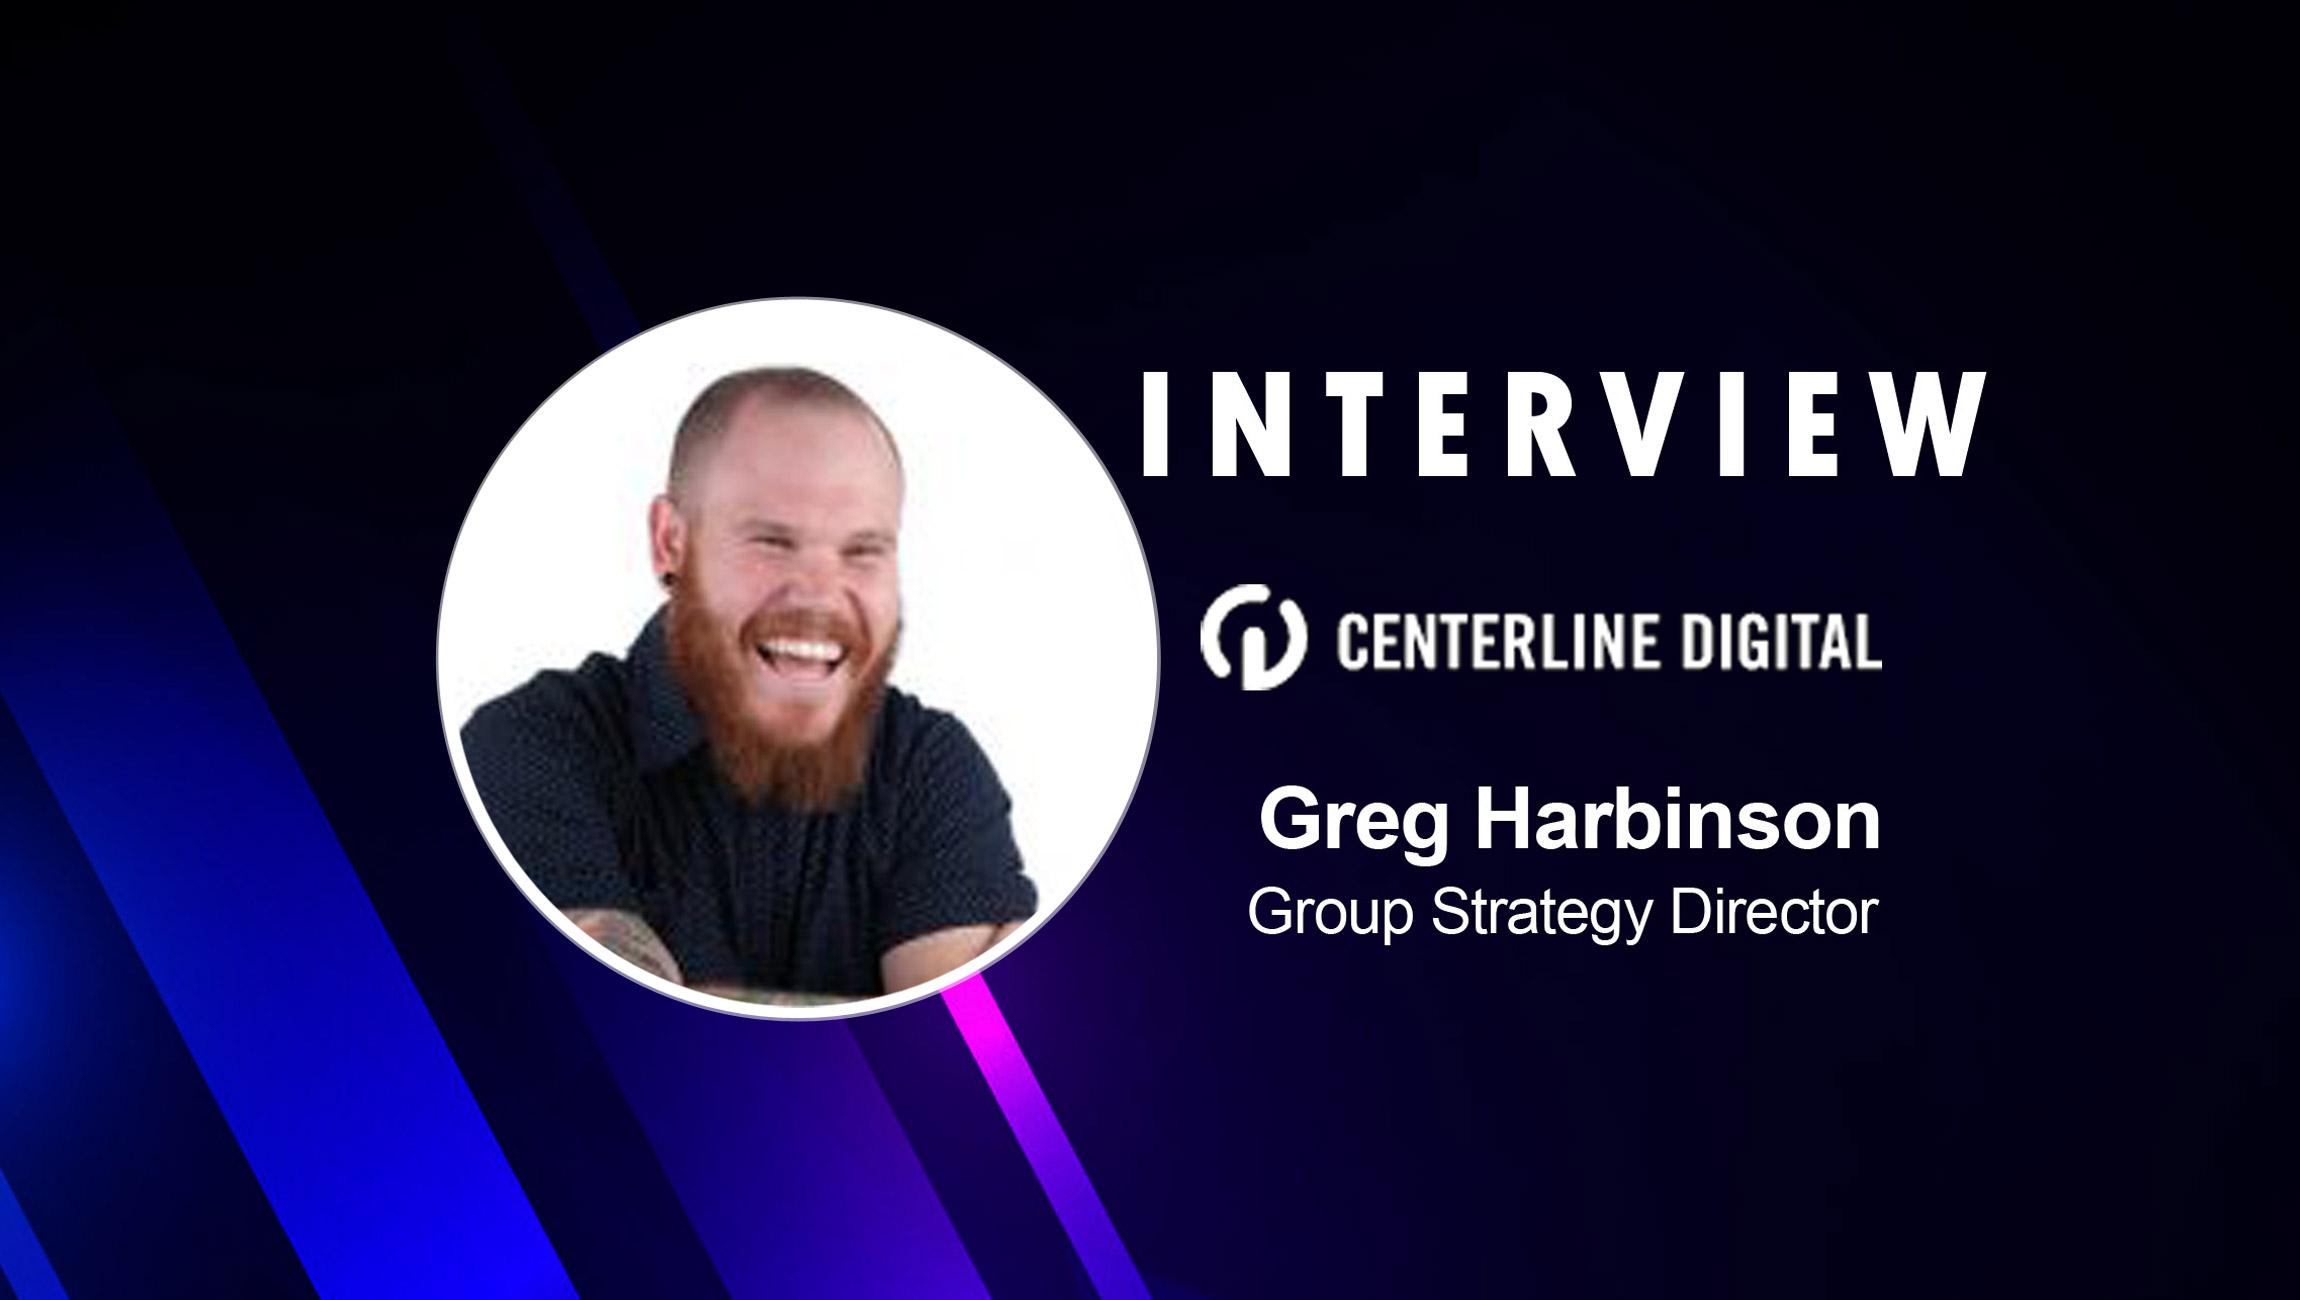 SalesTechStar Interview with Greg Harbinson, Group Strategy Director at Centerline Digital